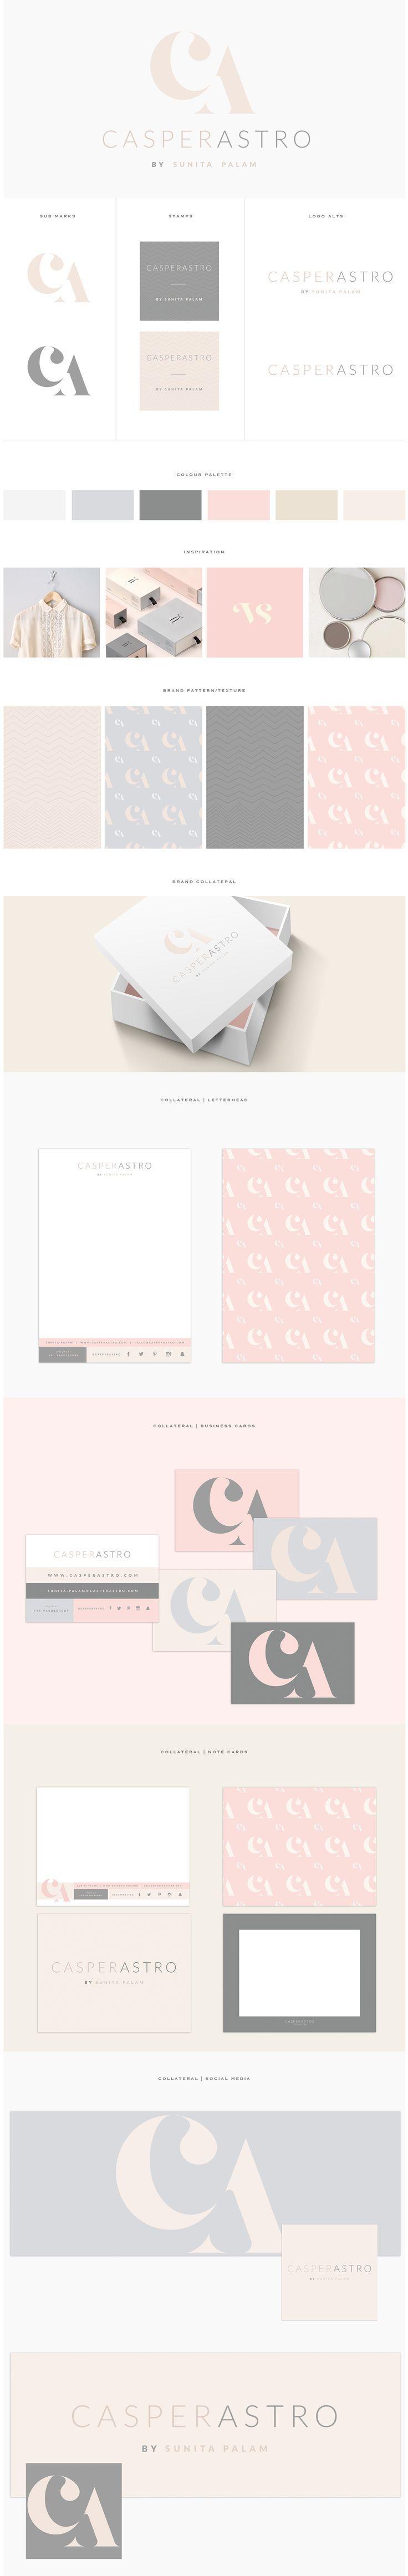 www.brandmebeautiful.co.uk | enquiries@brandmebeautiful.co.uk | Casperastro Brand Design #branding #branddesign #brand #logo #inspiration #colour #blush #nude #cream #pink #grey #charcoal #minimalist #monogram